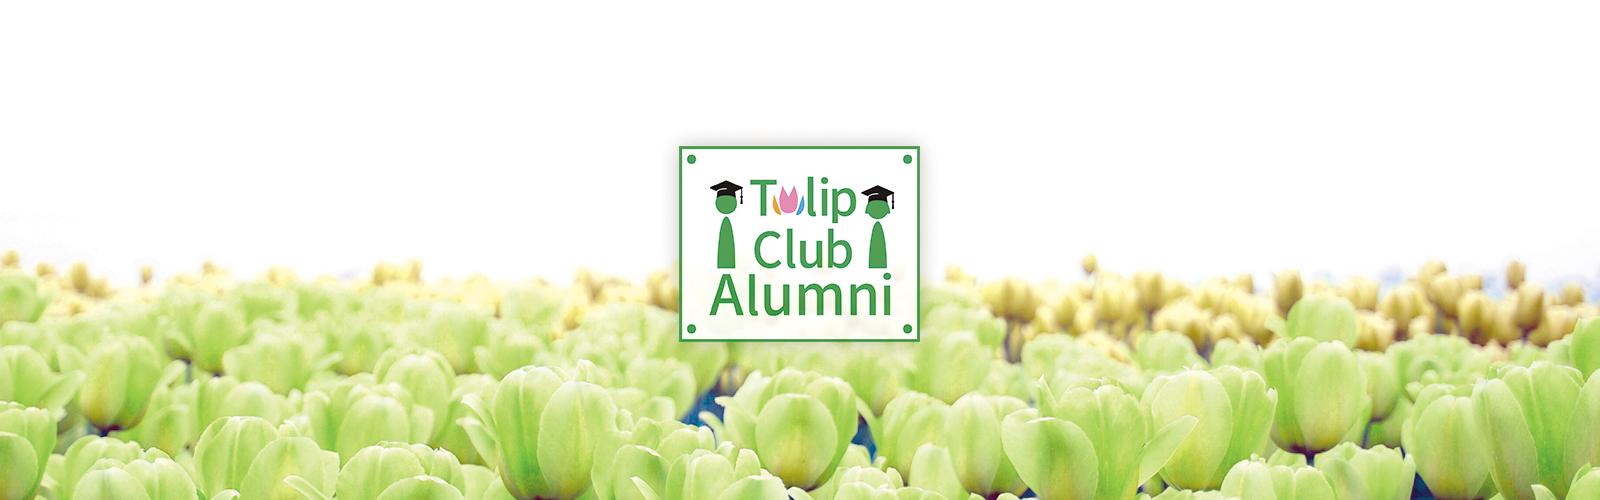 Tulip Club Alumni:チューリップ倶楽部アルムナイ